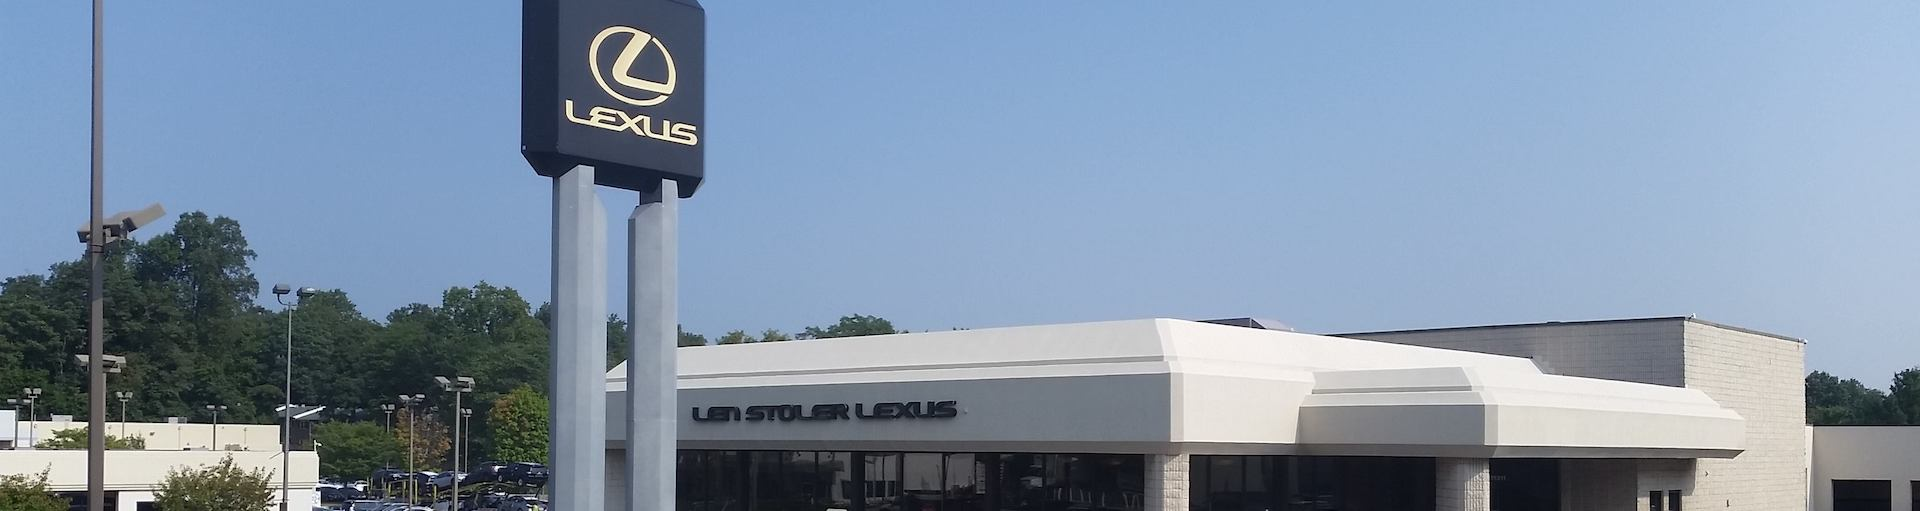 Len Stoler Lexus Service Department